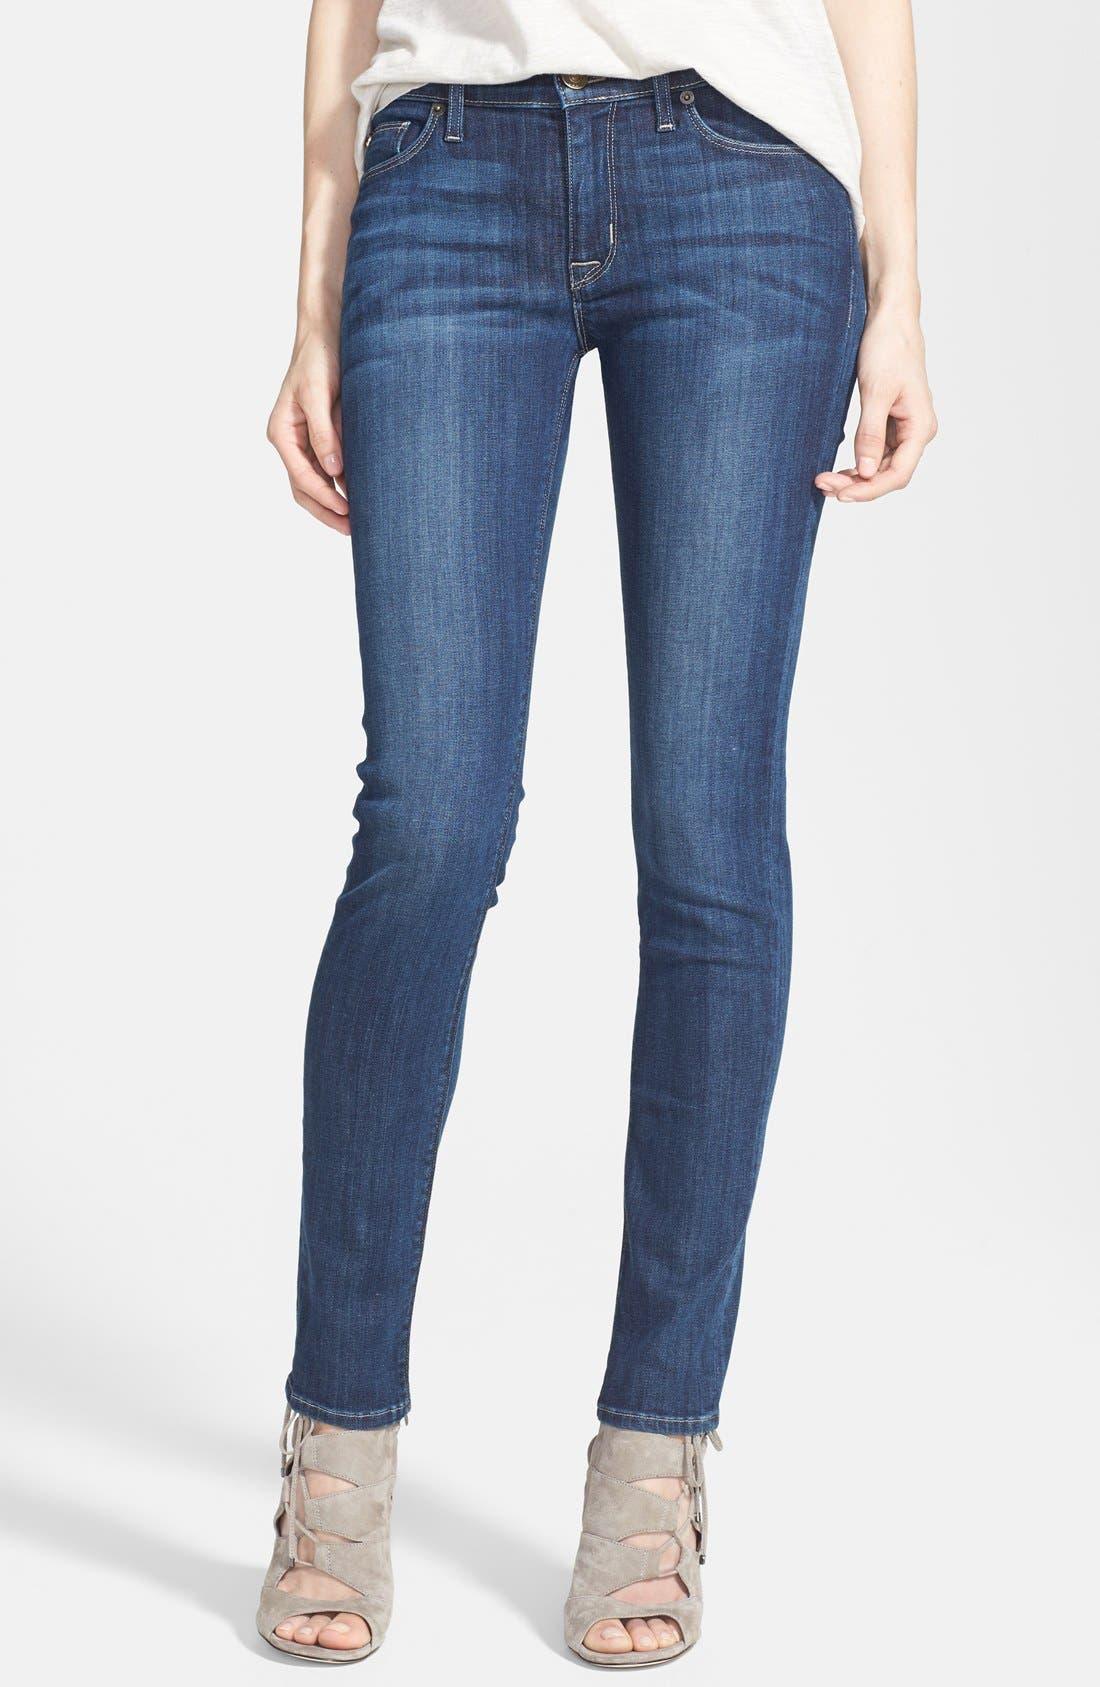 HUDSON JEANS, 'Collette' Skinny Jeans, Main thumbnail 1, color, 400